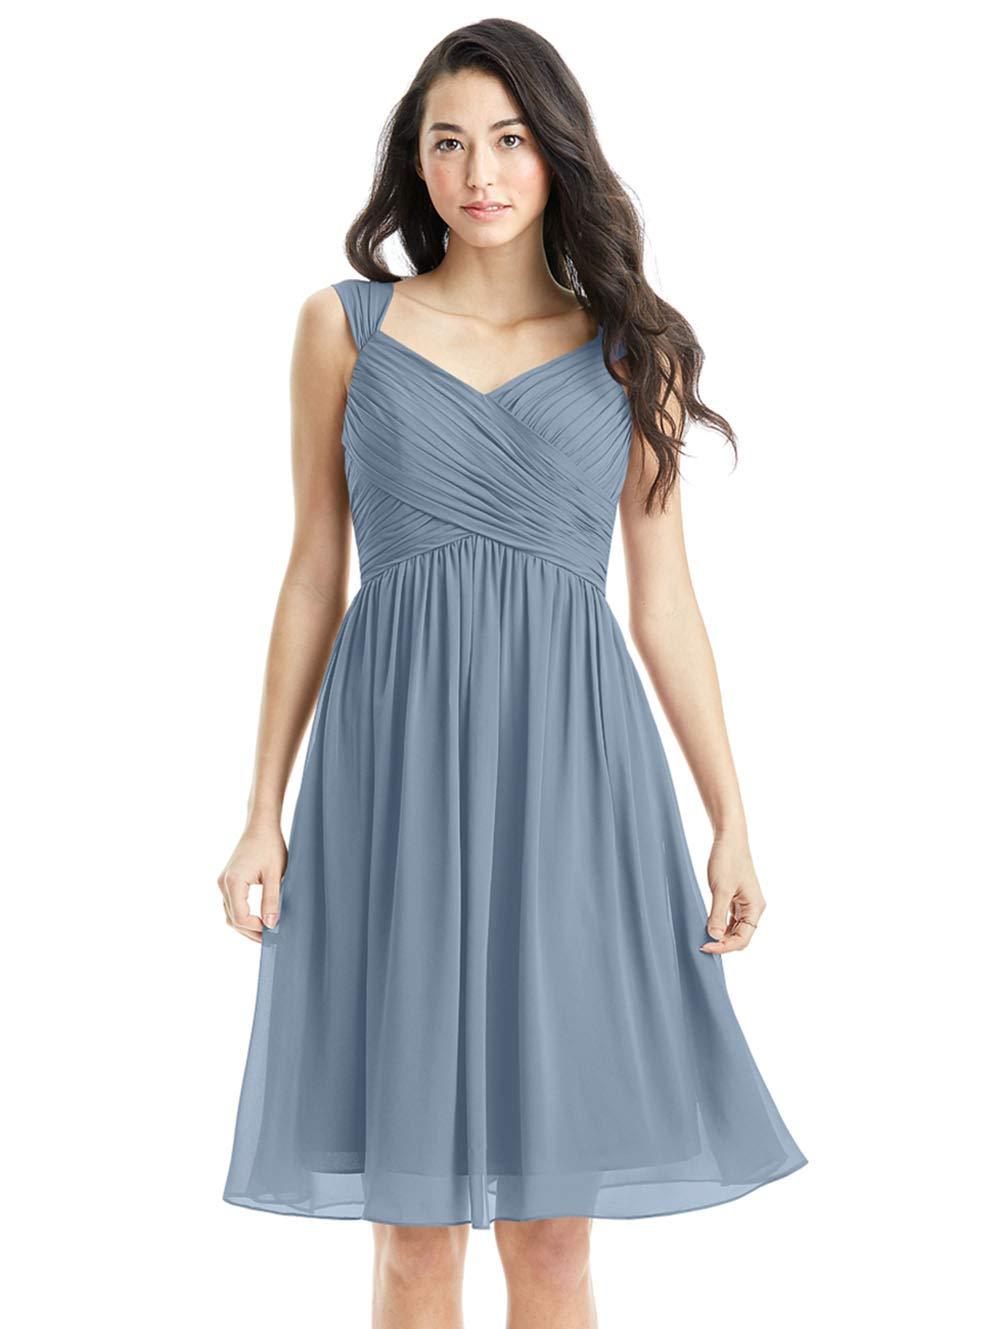 Zhongde V-Neck Chiffon Homecoming Dresses Short Knee Length Plus Size  Bridesmaid Dress with Pockets Pocket Dusty Blue Size 26